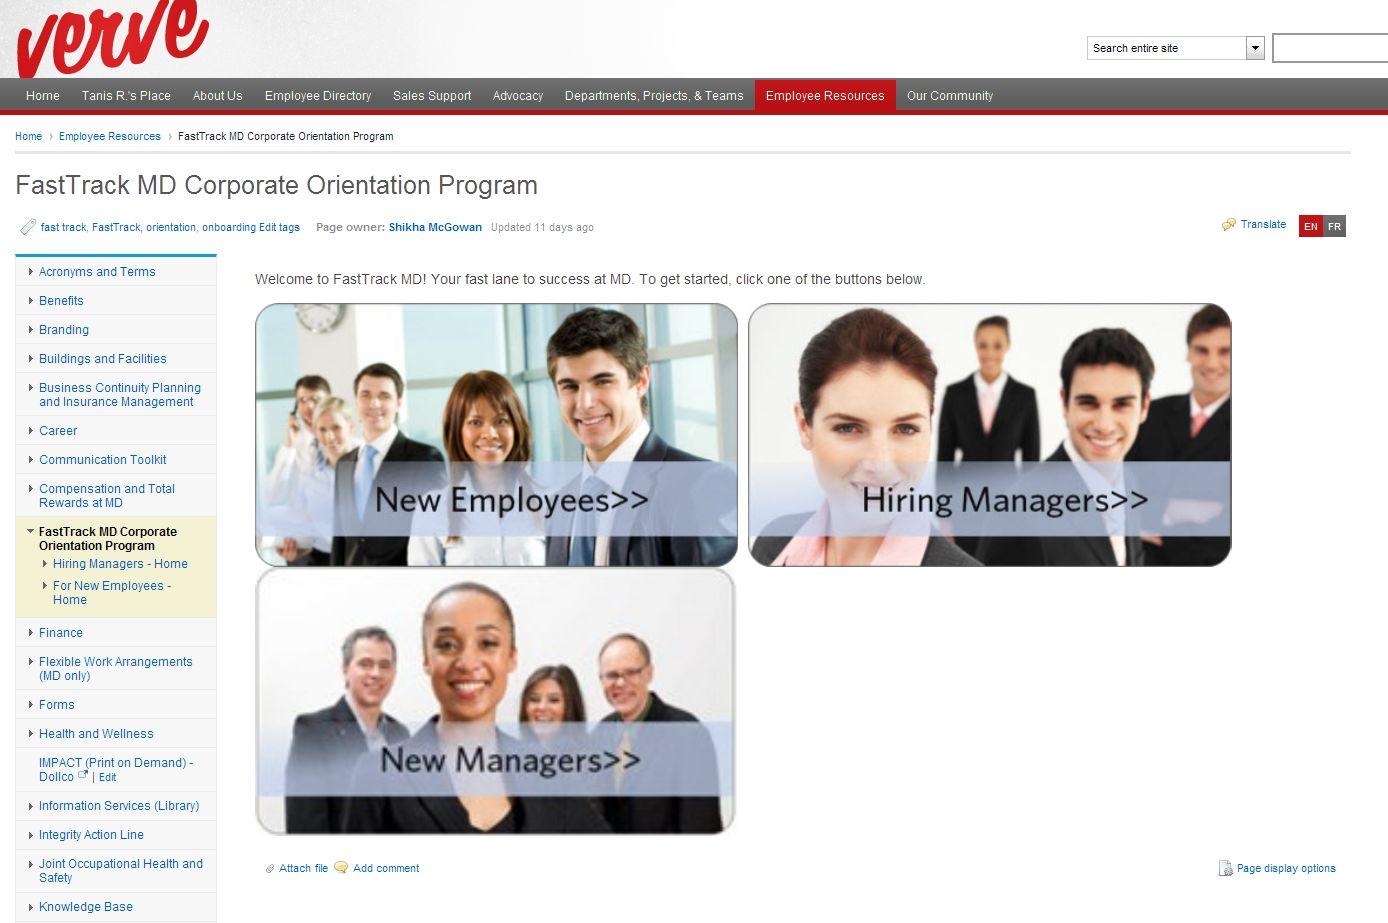 FastTrack MD Corporate Orientation Program